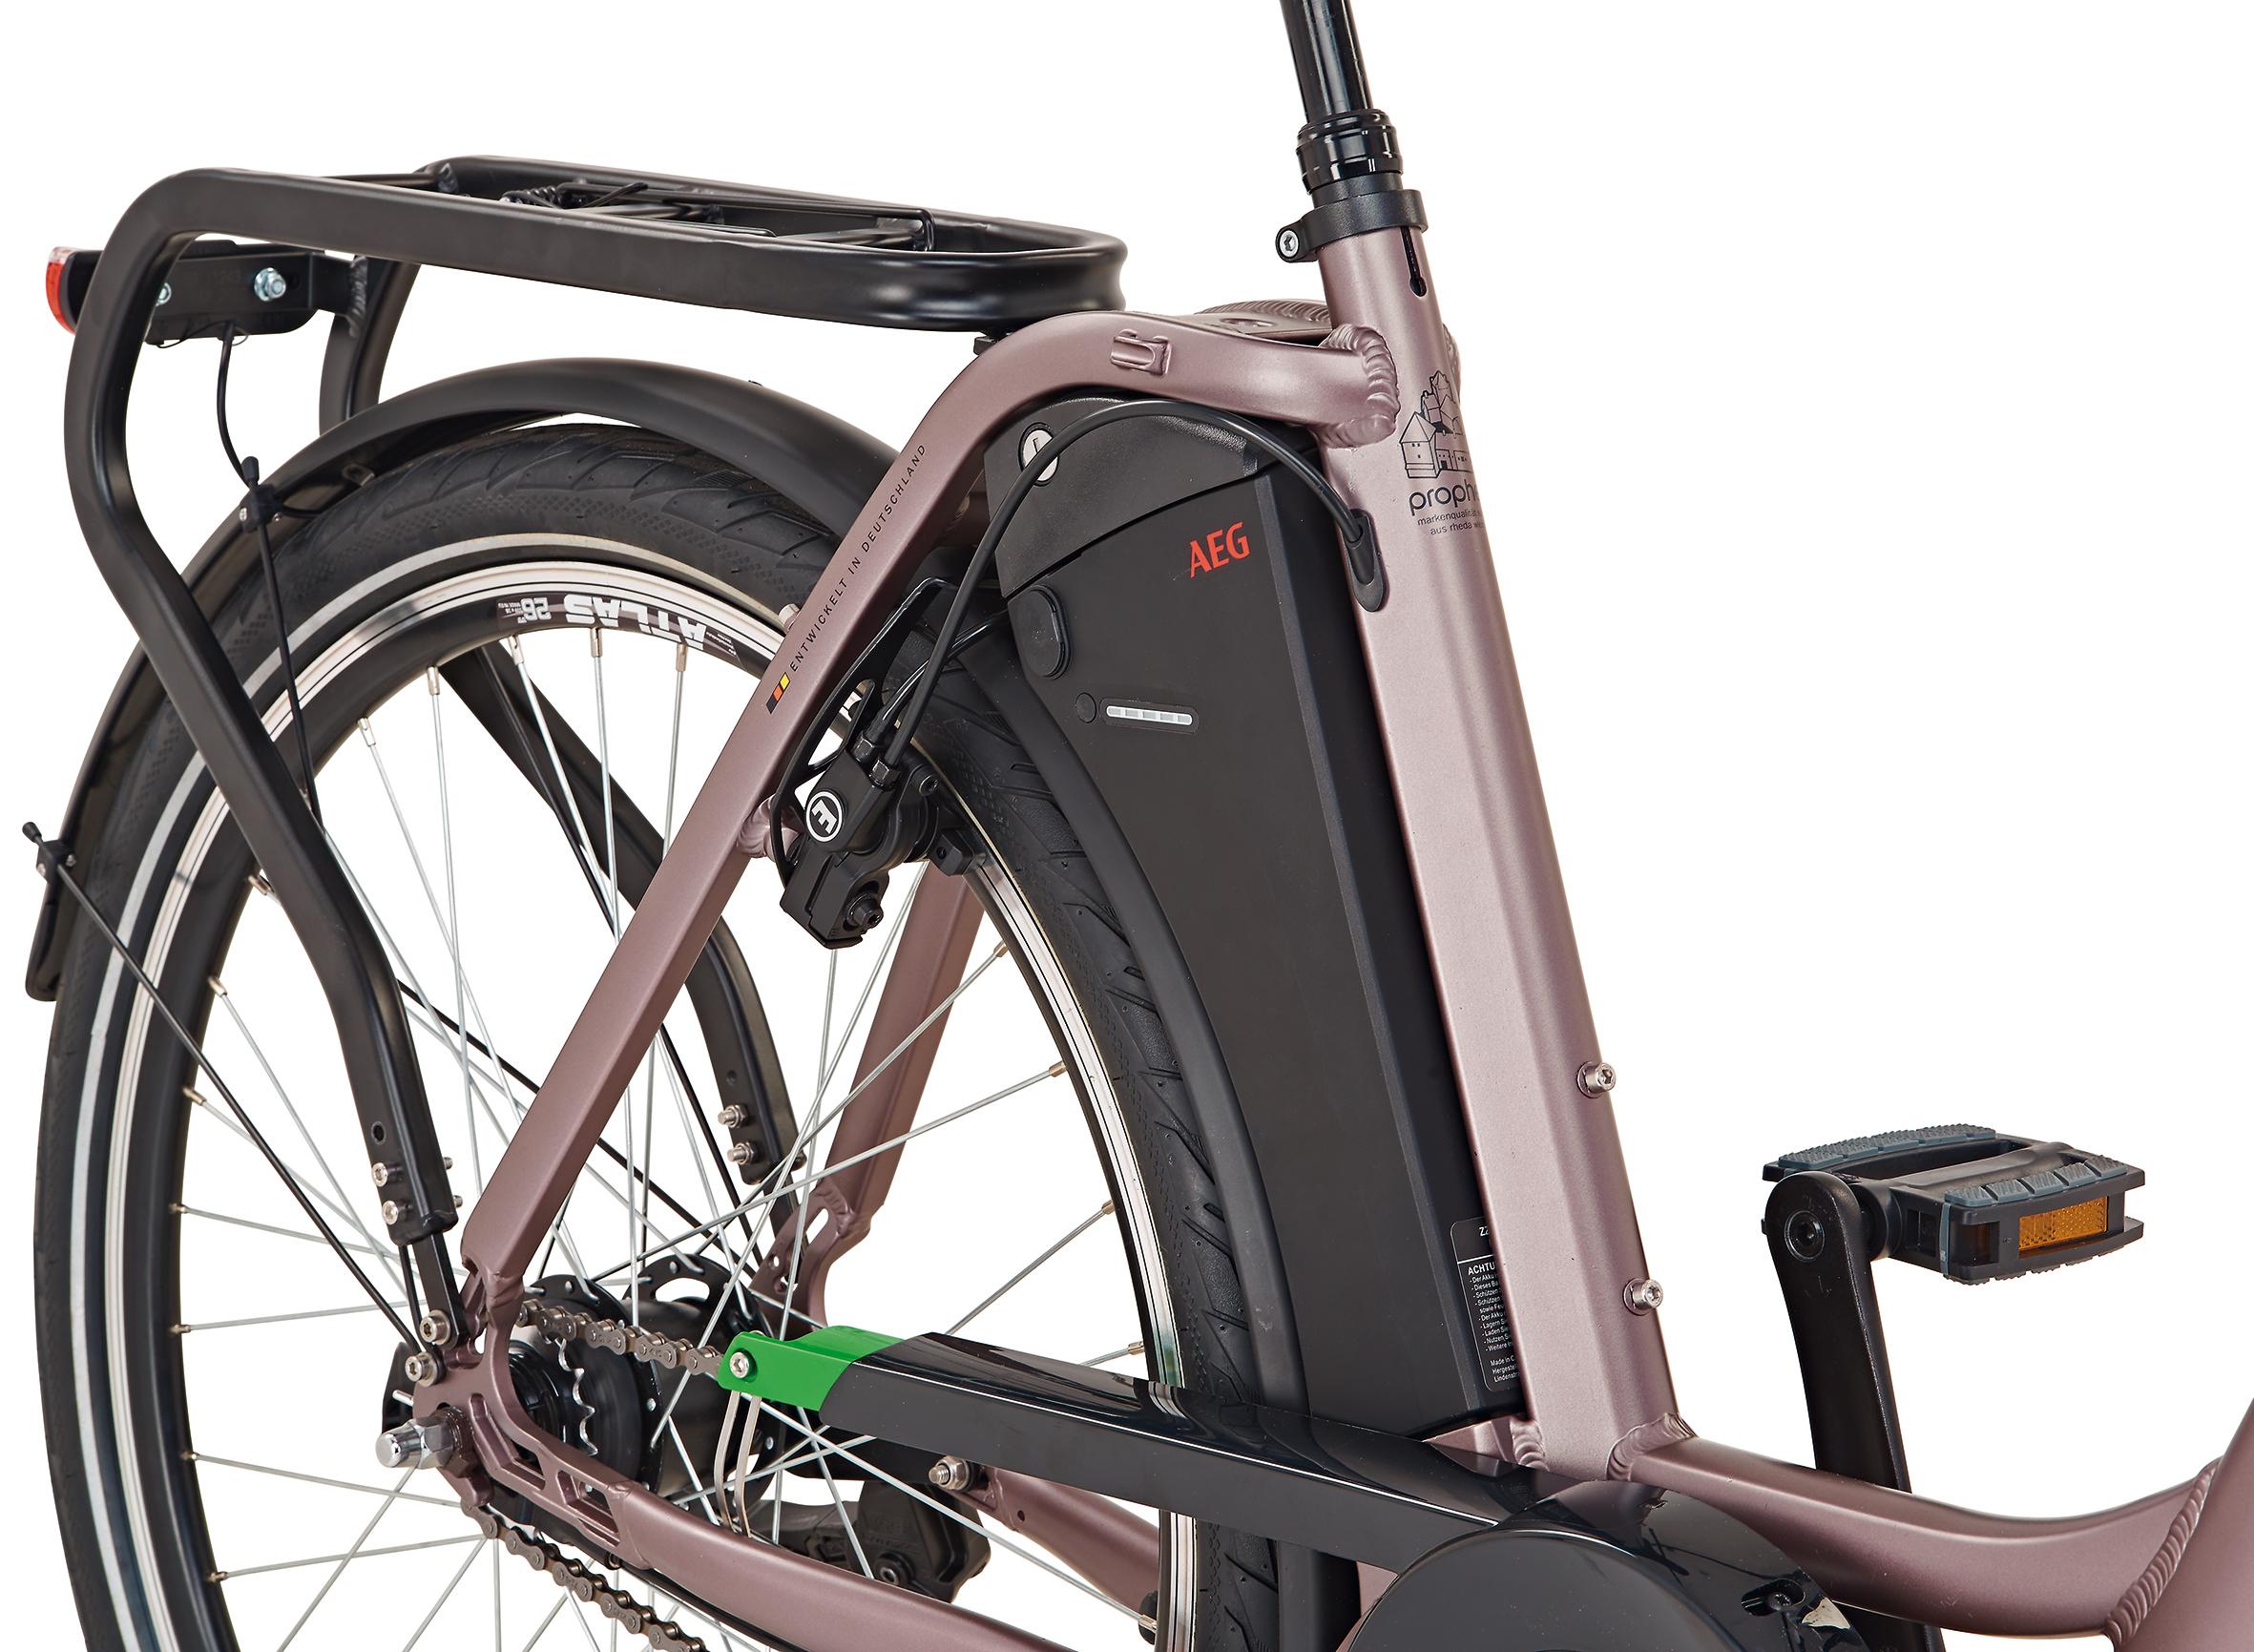 "Prophete Elektrofahrrad / E-Bike Geniesser e9.7 City E-Bike 26"" grau Bild 2"